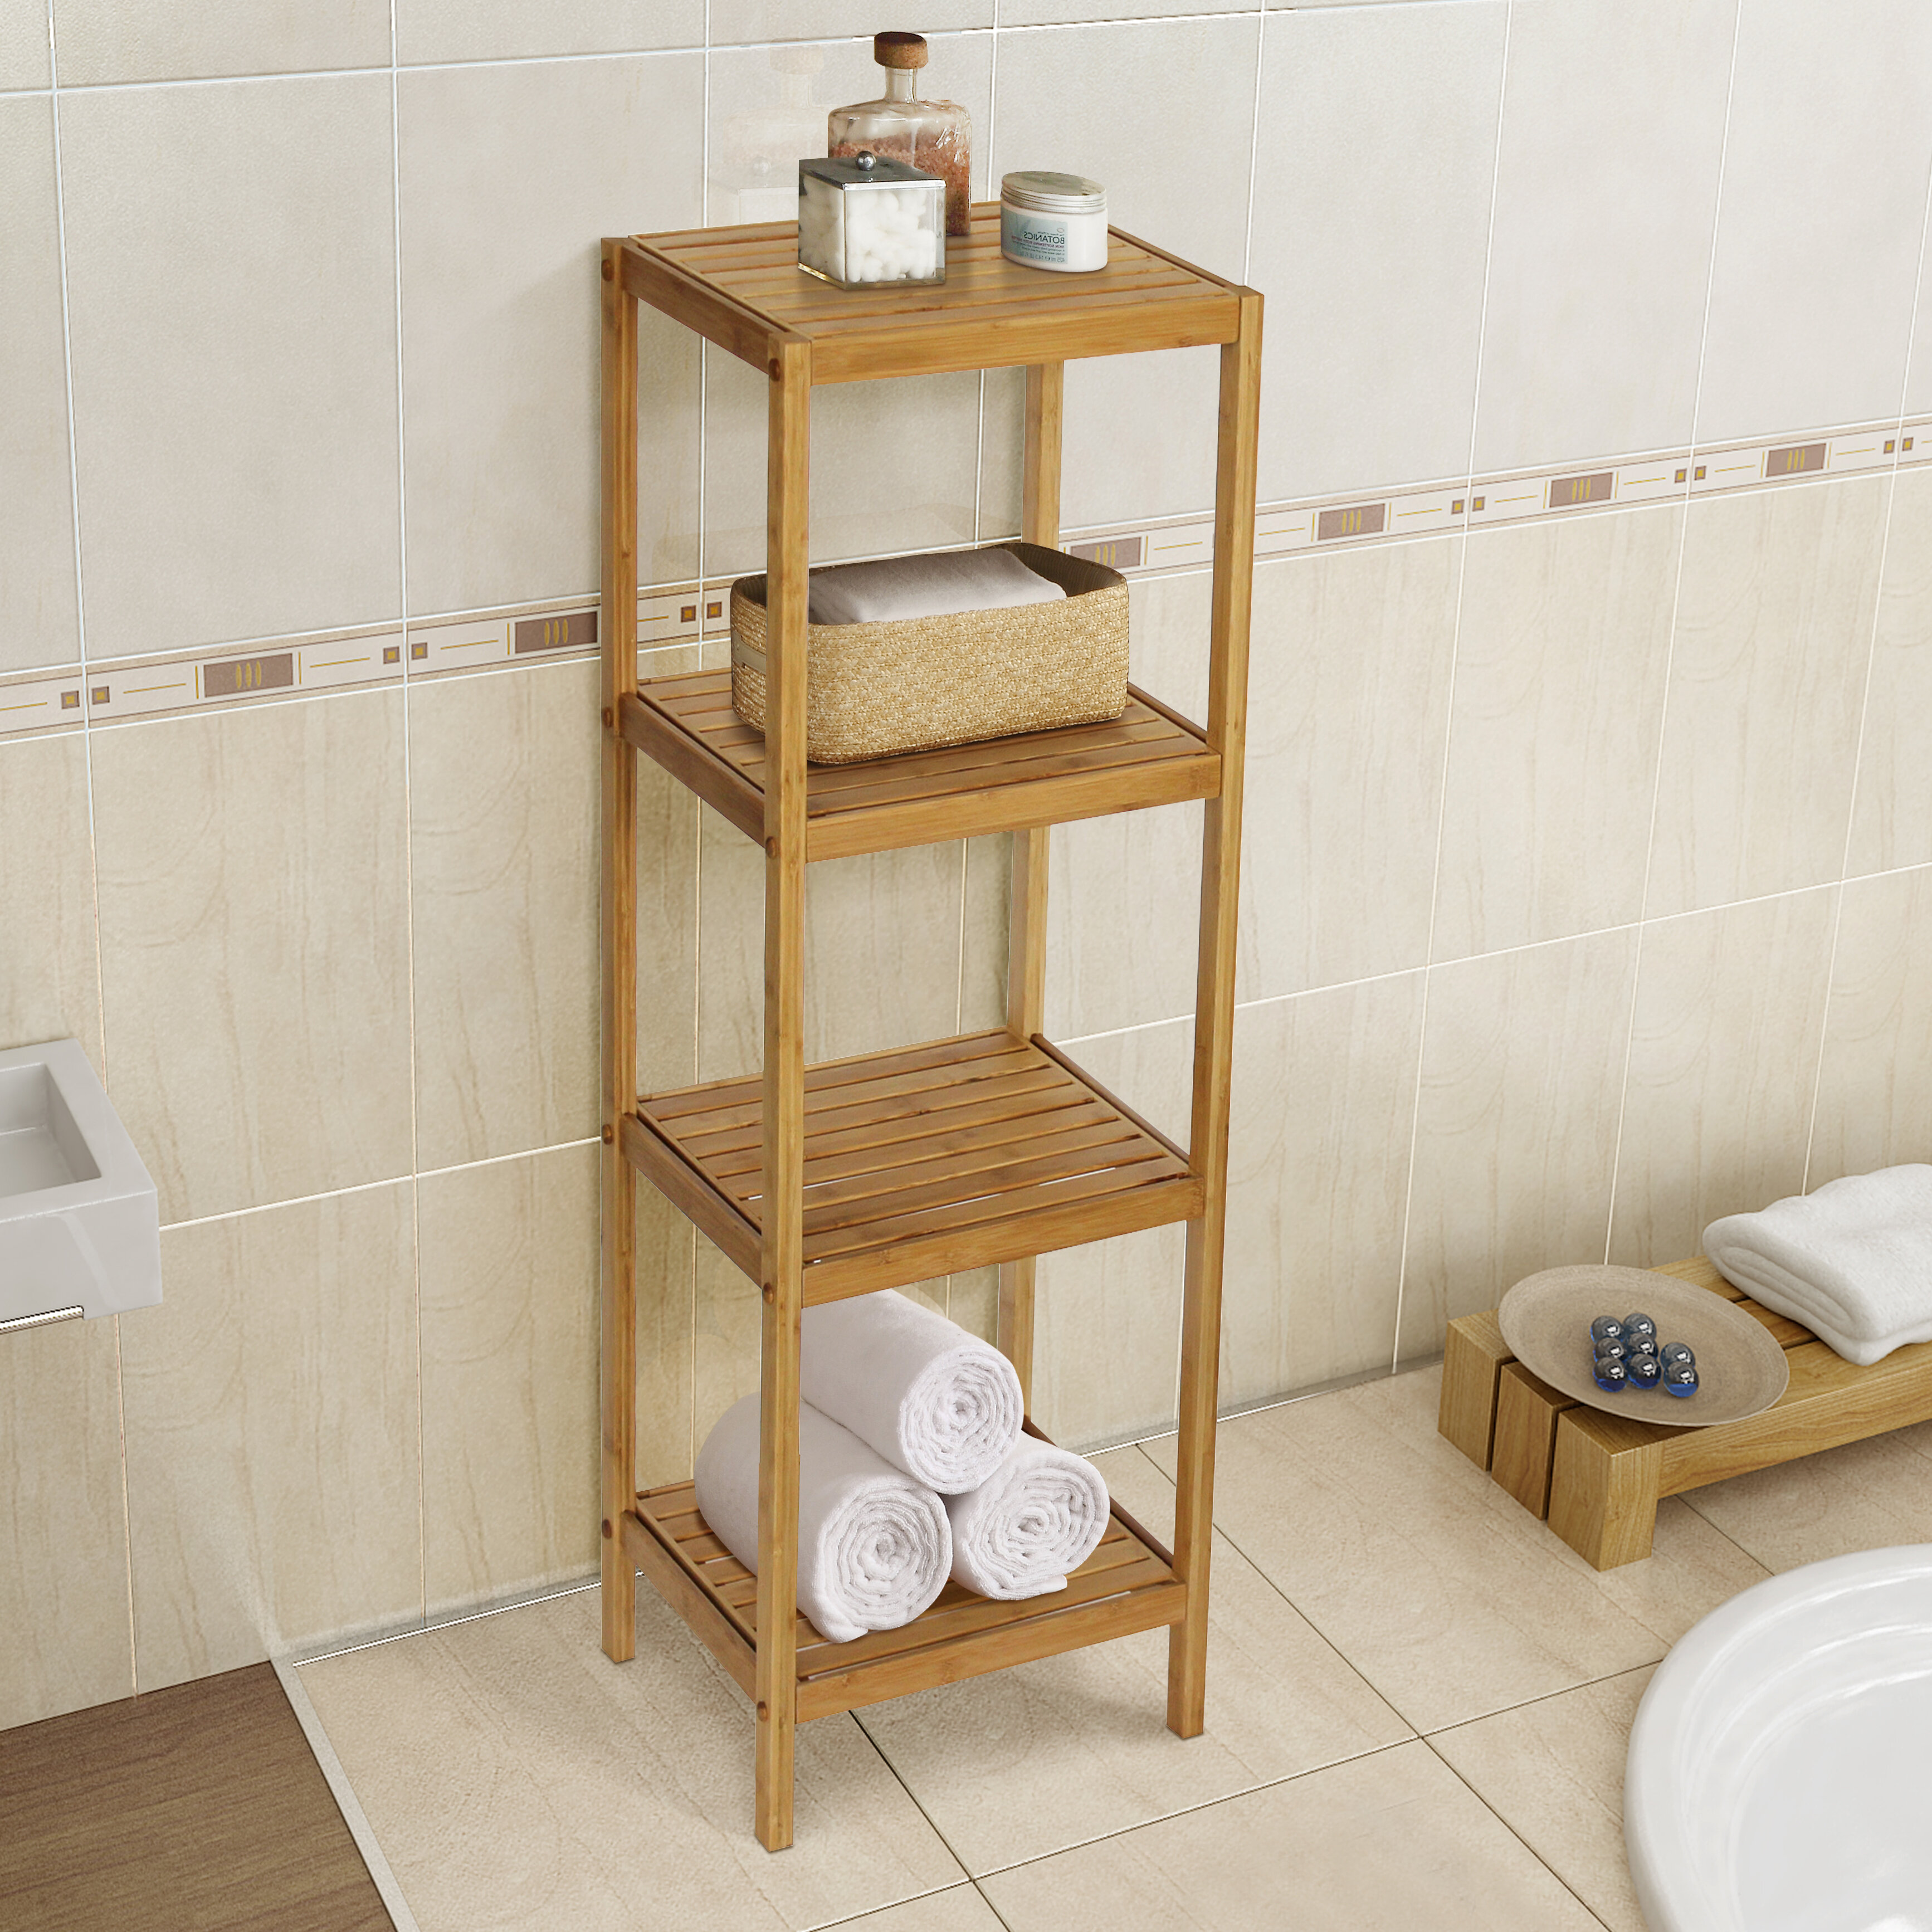 keucoyliving blog shelves necessities edition modern shower bath yliving keuco shelf from design bathroom